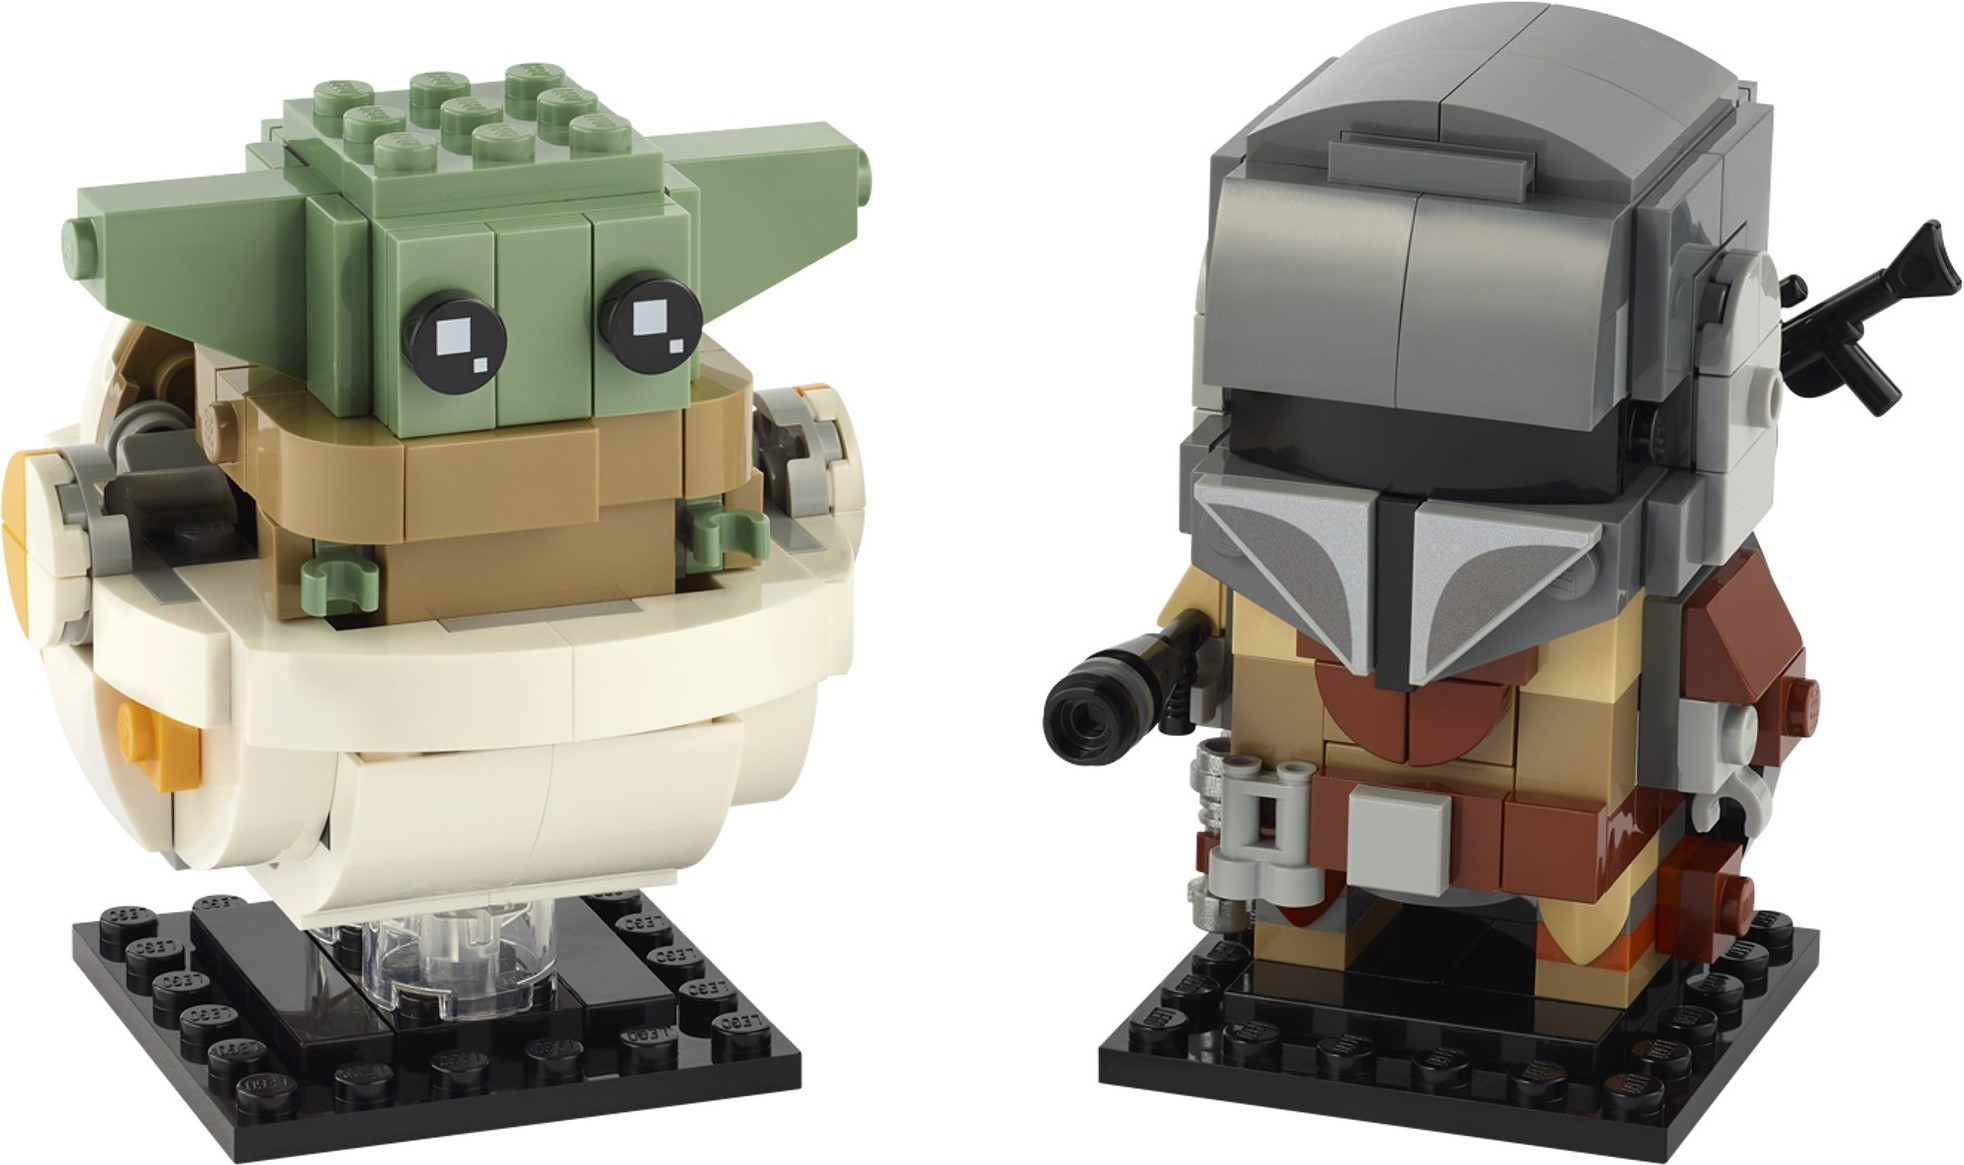 Lego BRICK HEADZ Range Select your Part Number Multiple Choice!